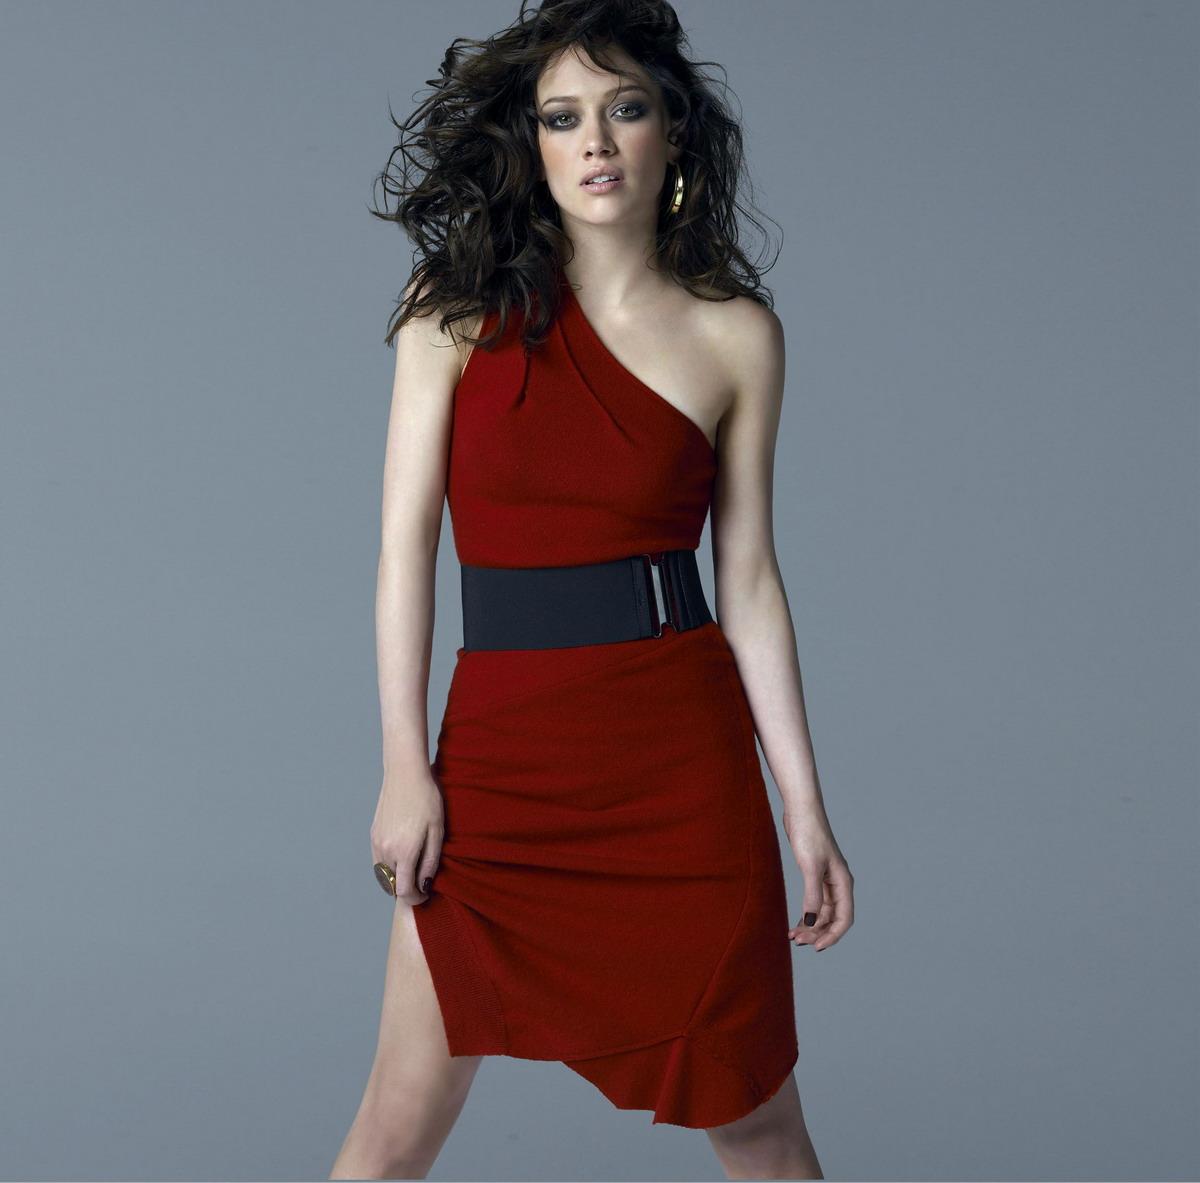 http://st.kinopoisk.ru/im/kadr/9/0/5/kinopoisk.ru-Hilary-Duff-905898.jpg